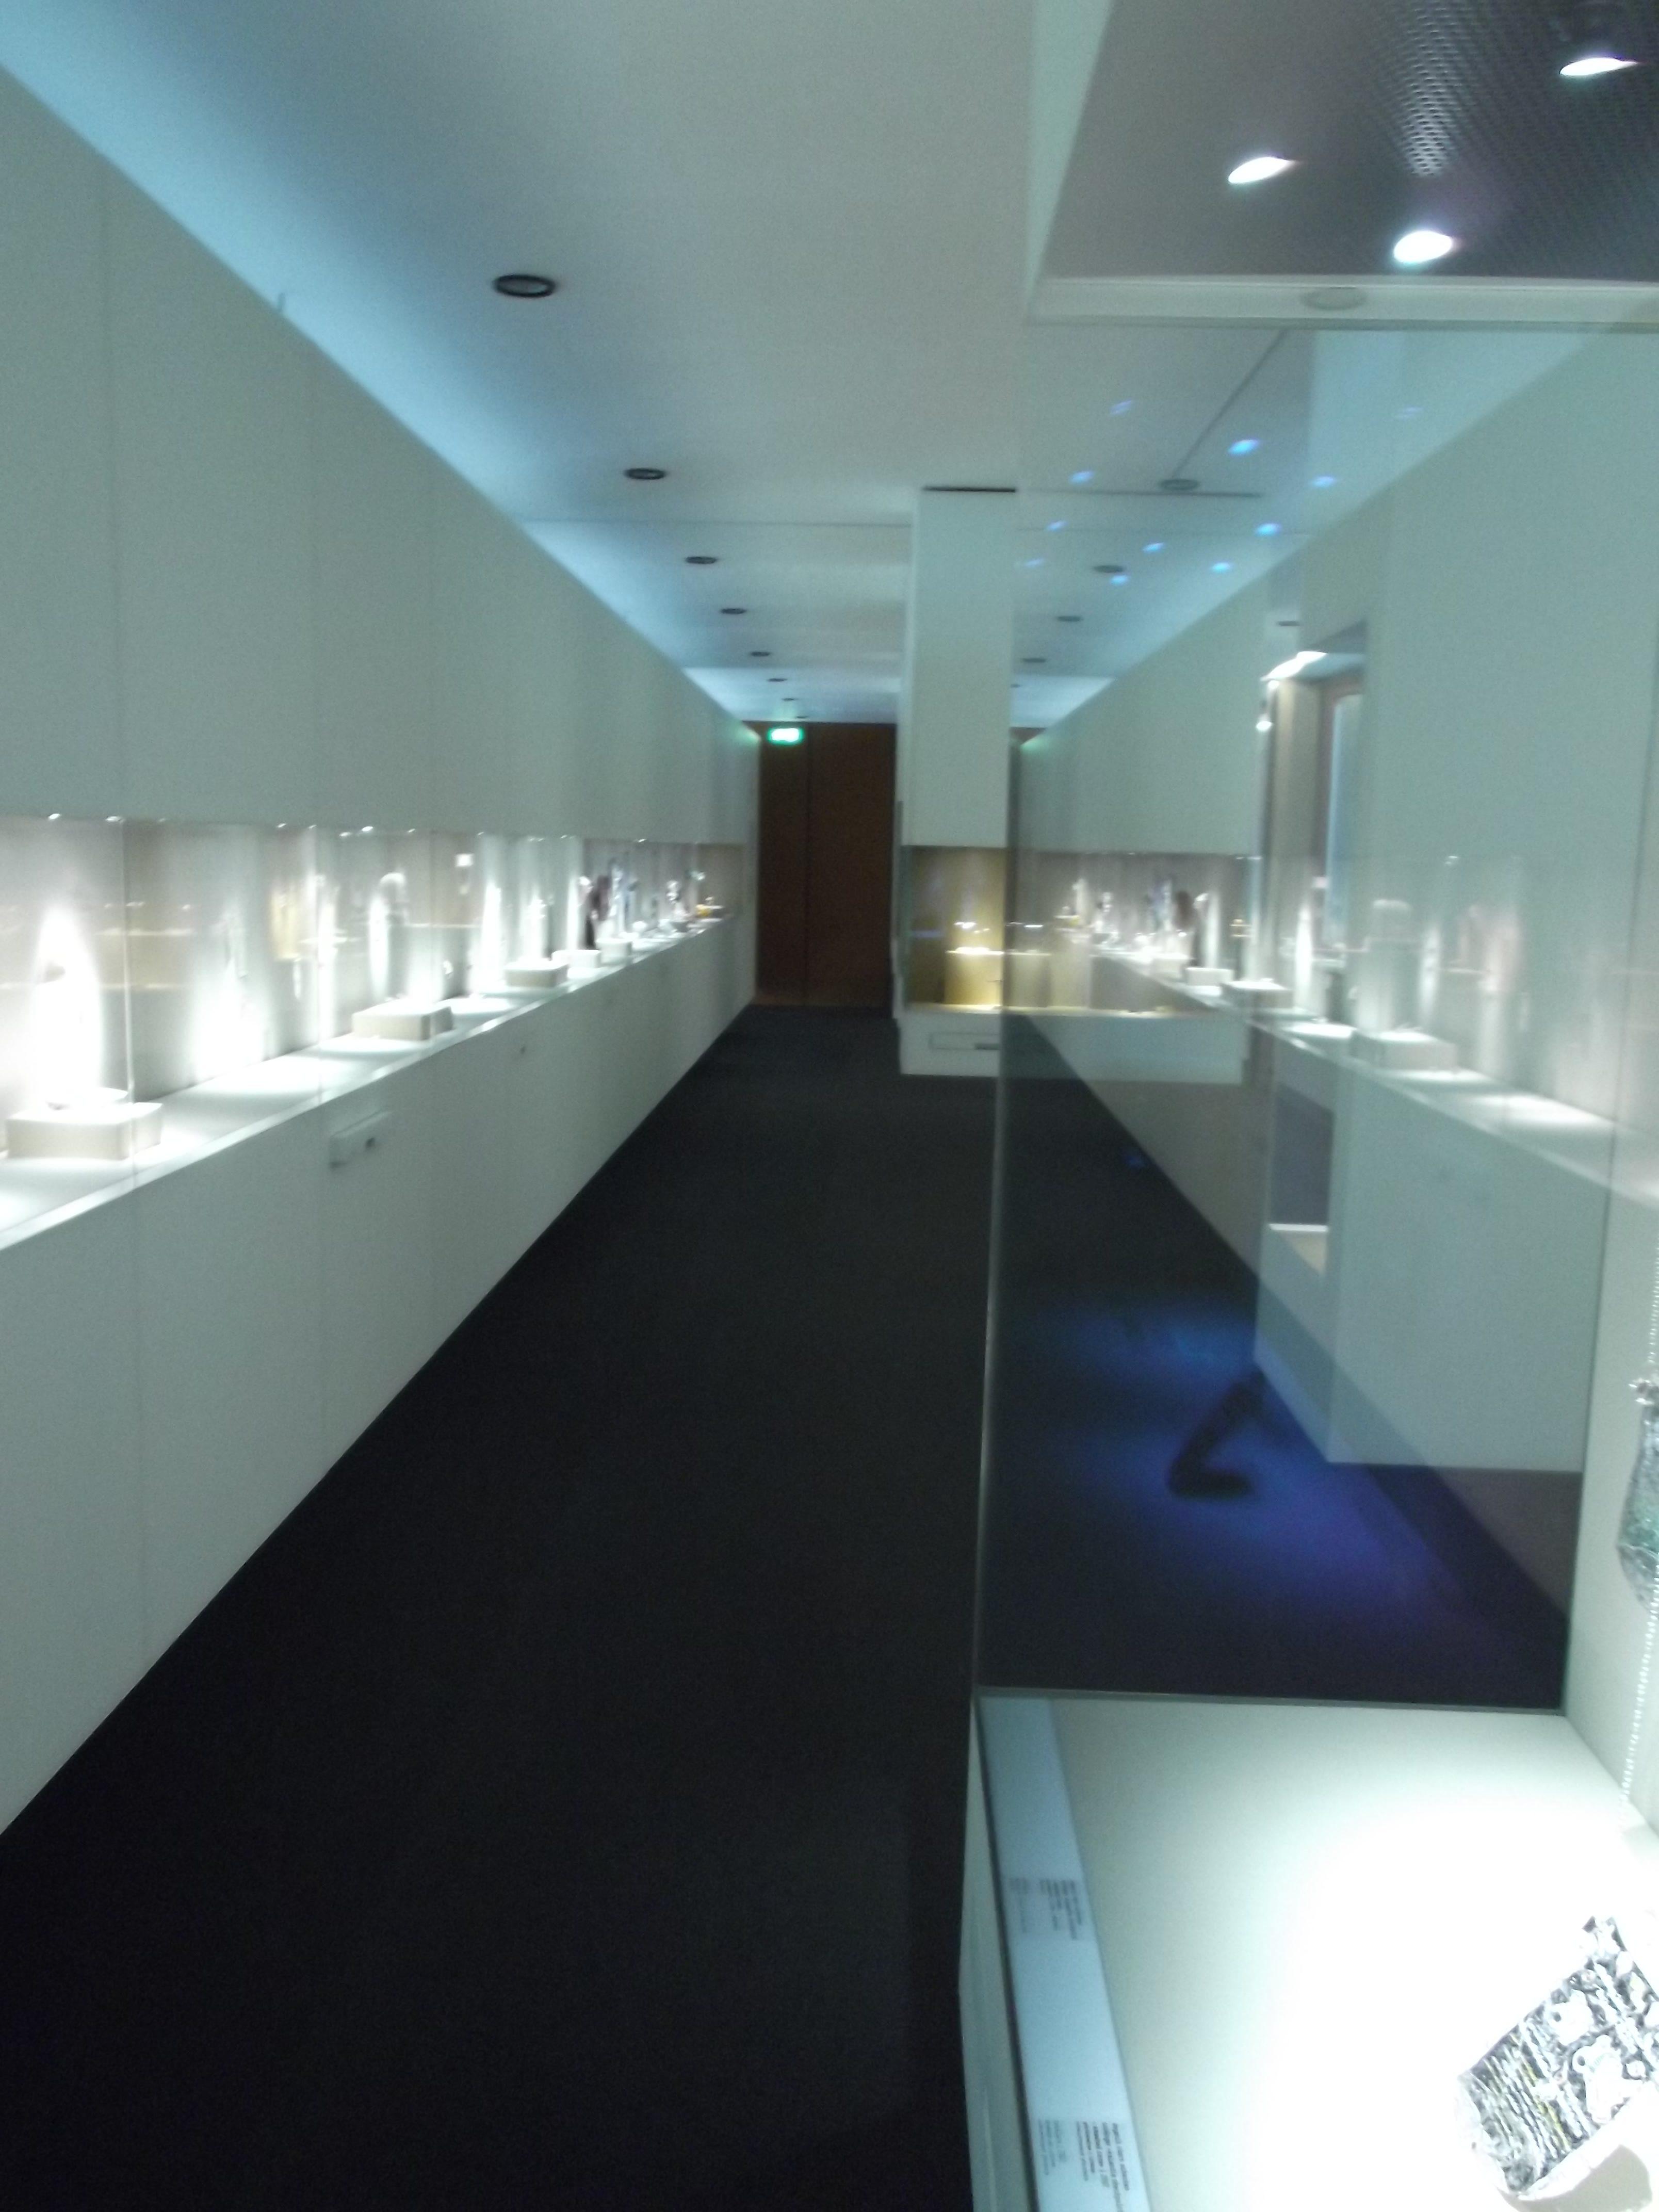 Transit, Schmuckmuseum Pforzheim, 2012. Foto met dank aan Jürgen Eickhoff, vitrines, tentoonstelling